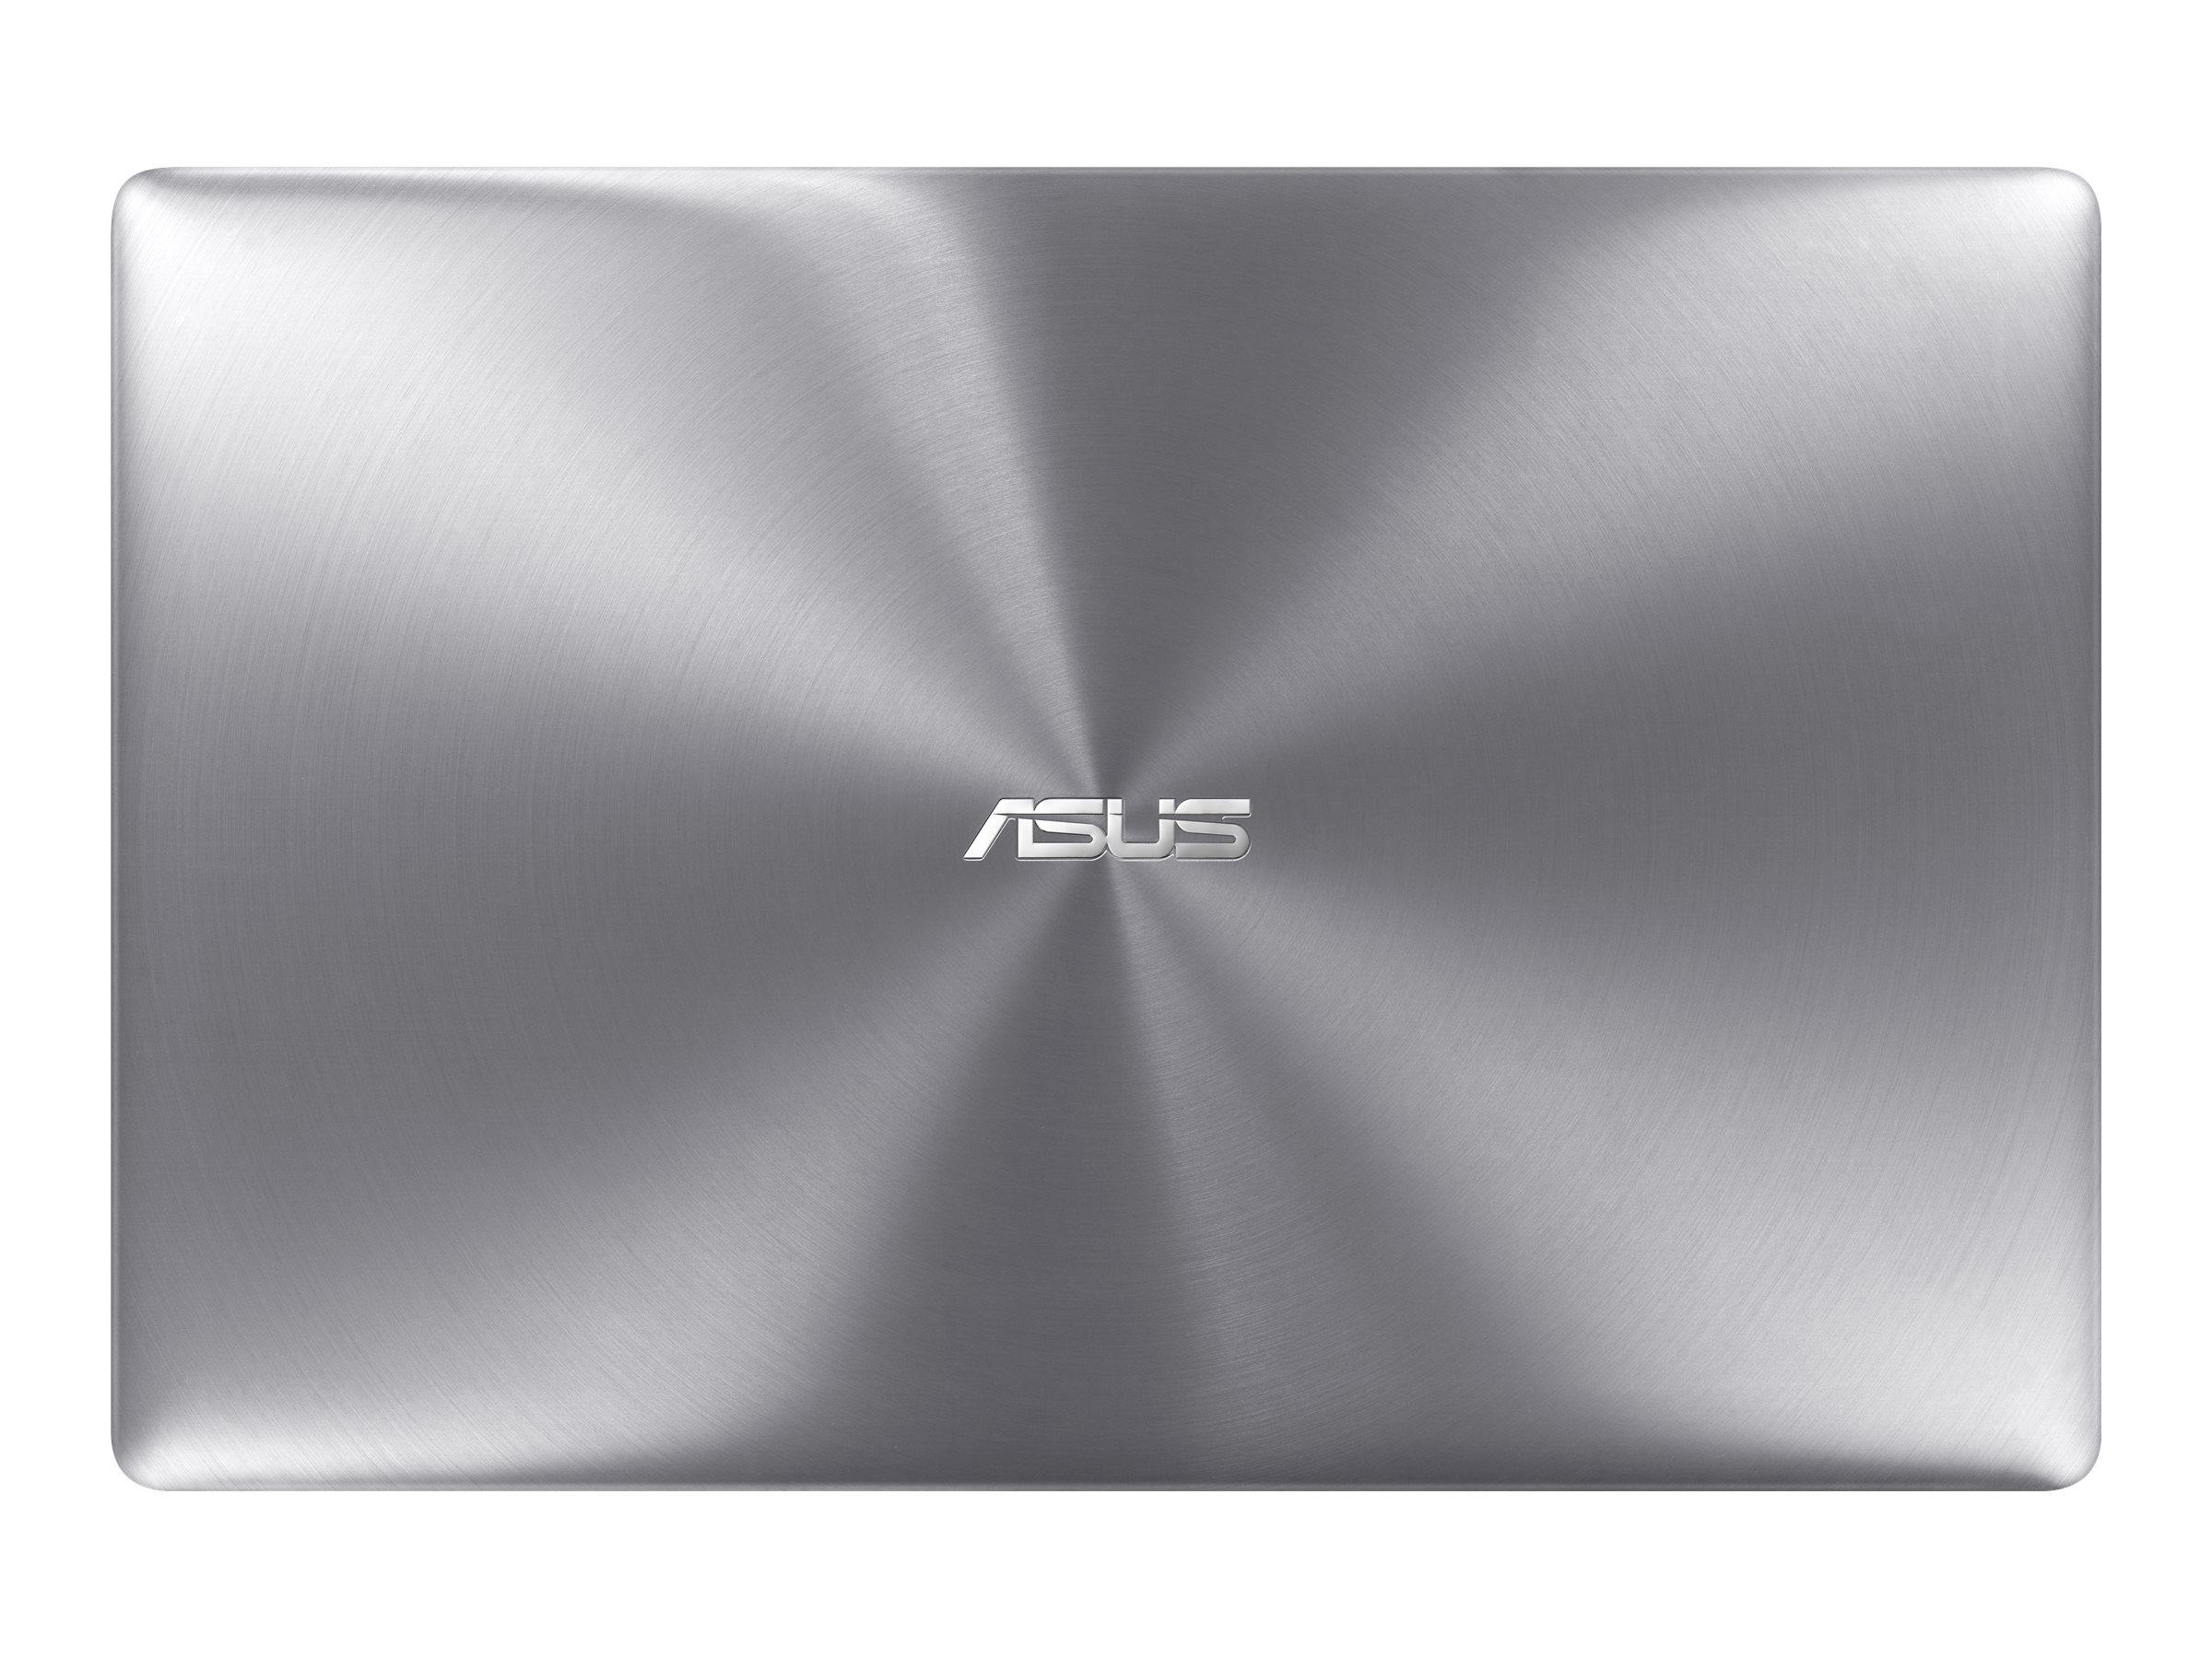 Asus UX501VW-XS74T Image 6